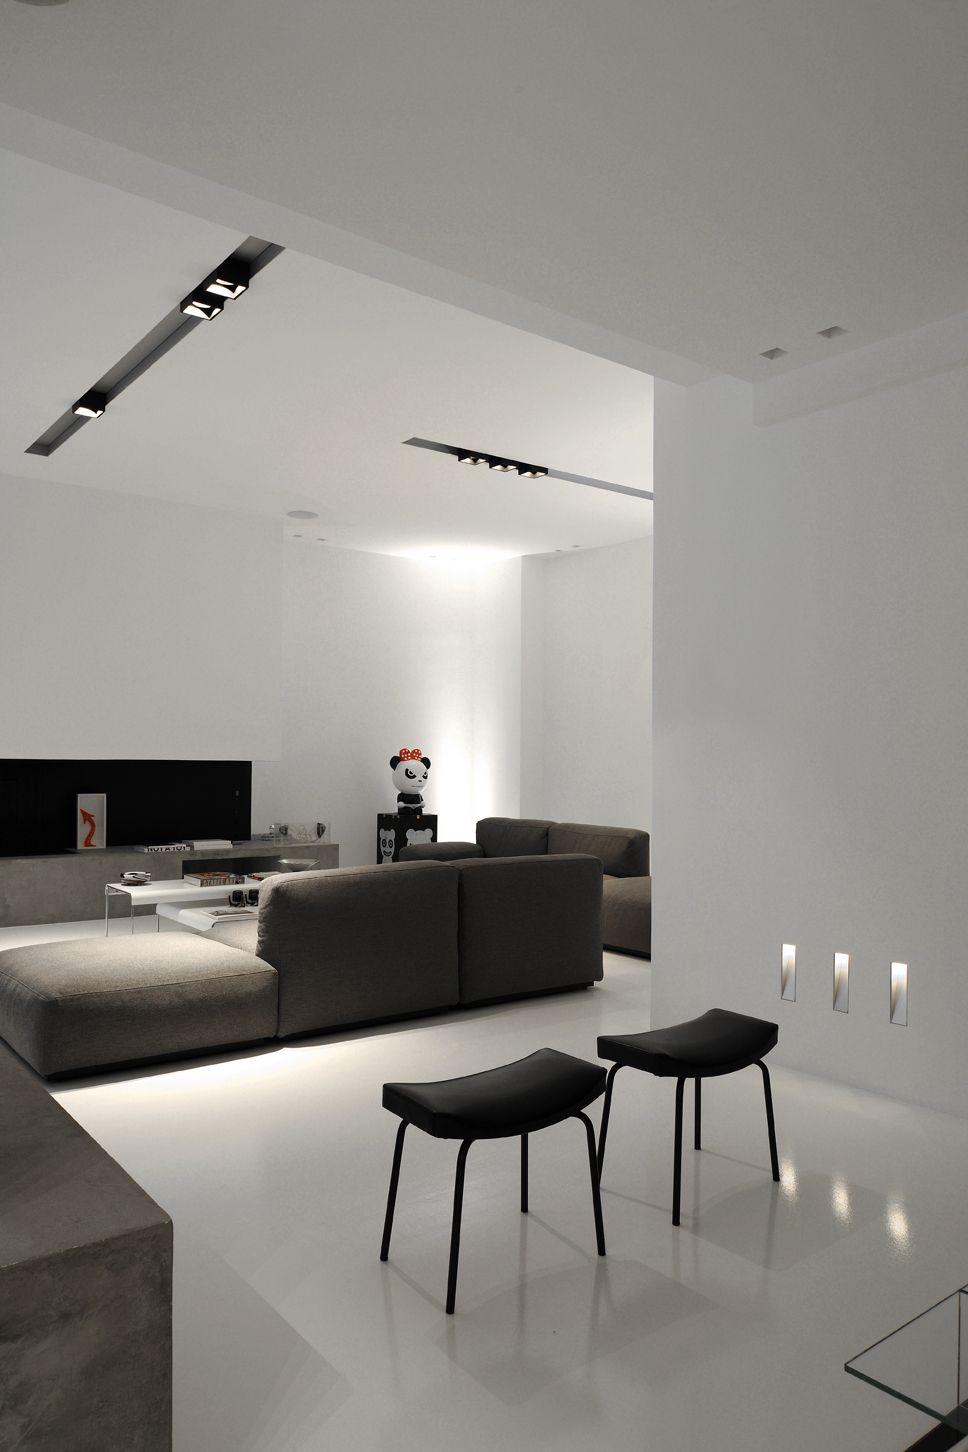 Verlichting boven keukenblad | Verlichting | Pinterest | Dark ...